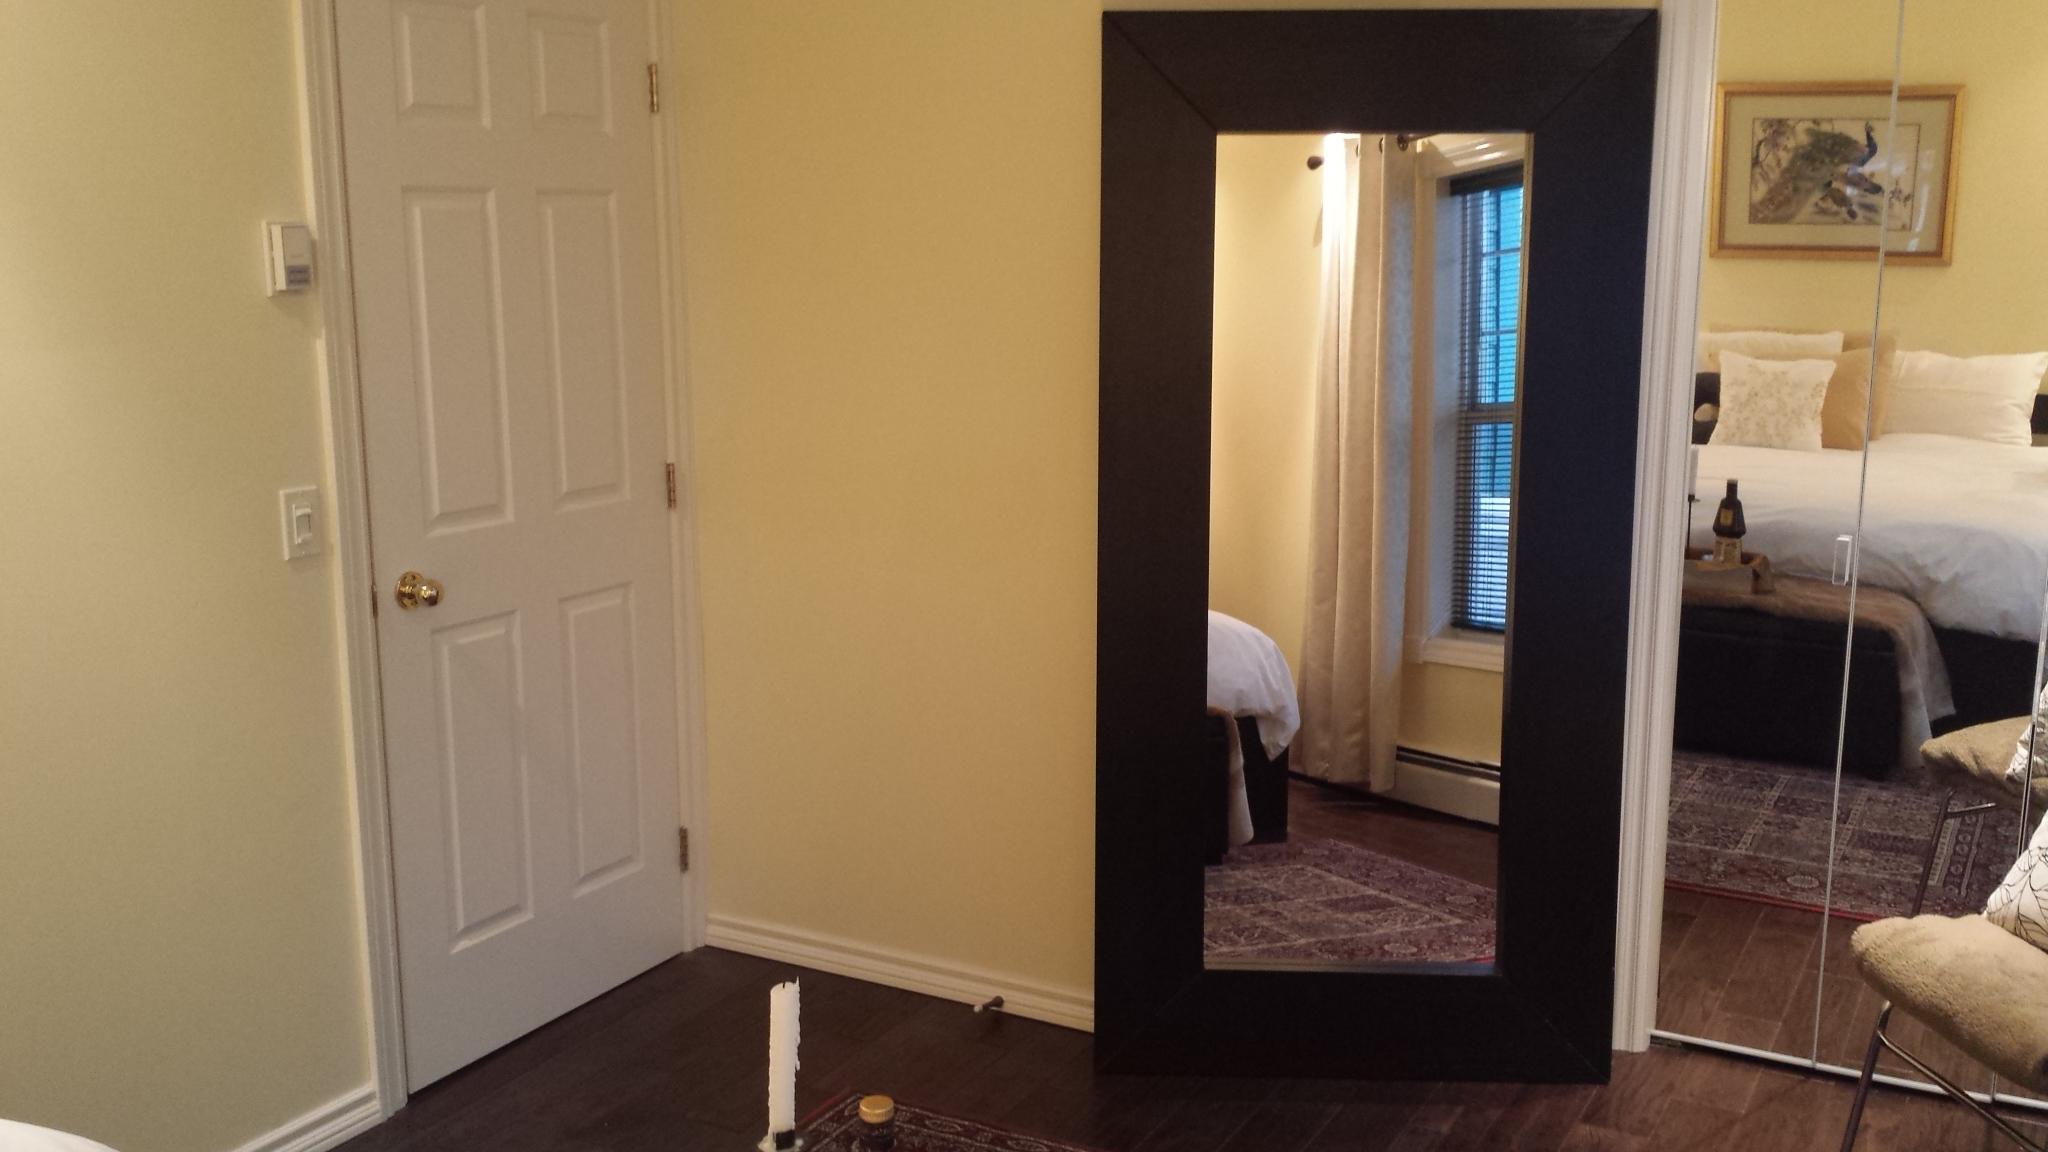 Unit 204 - Master Bedroom 5